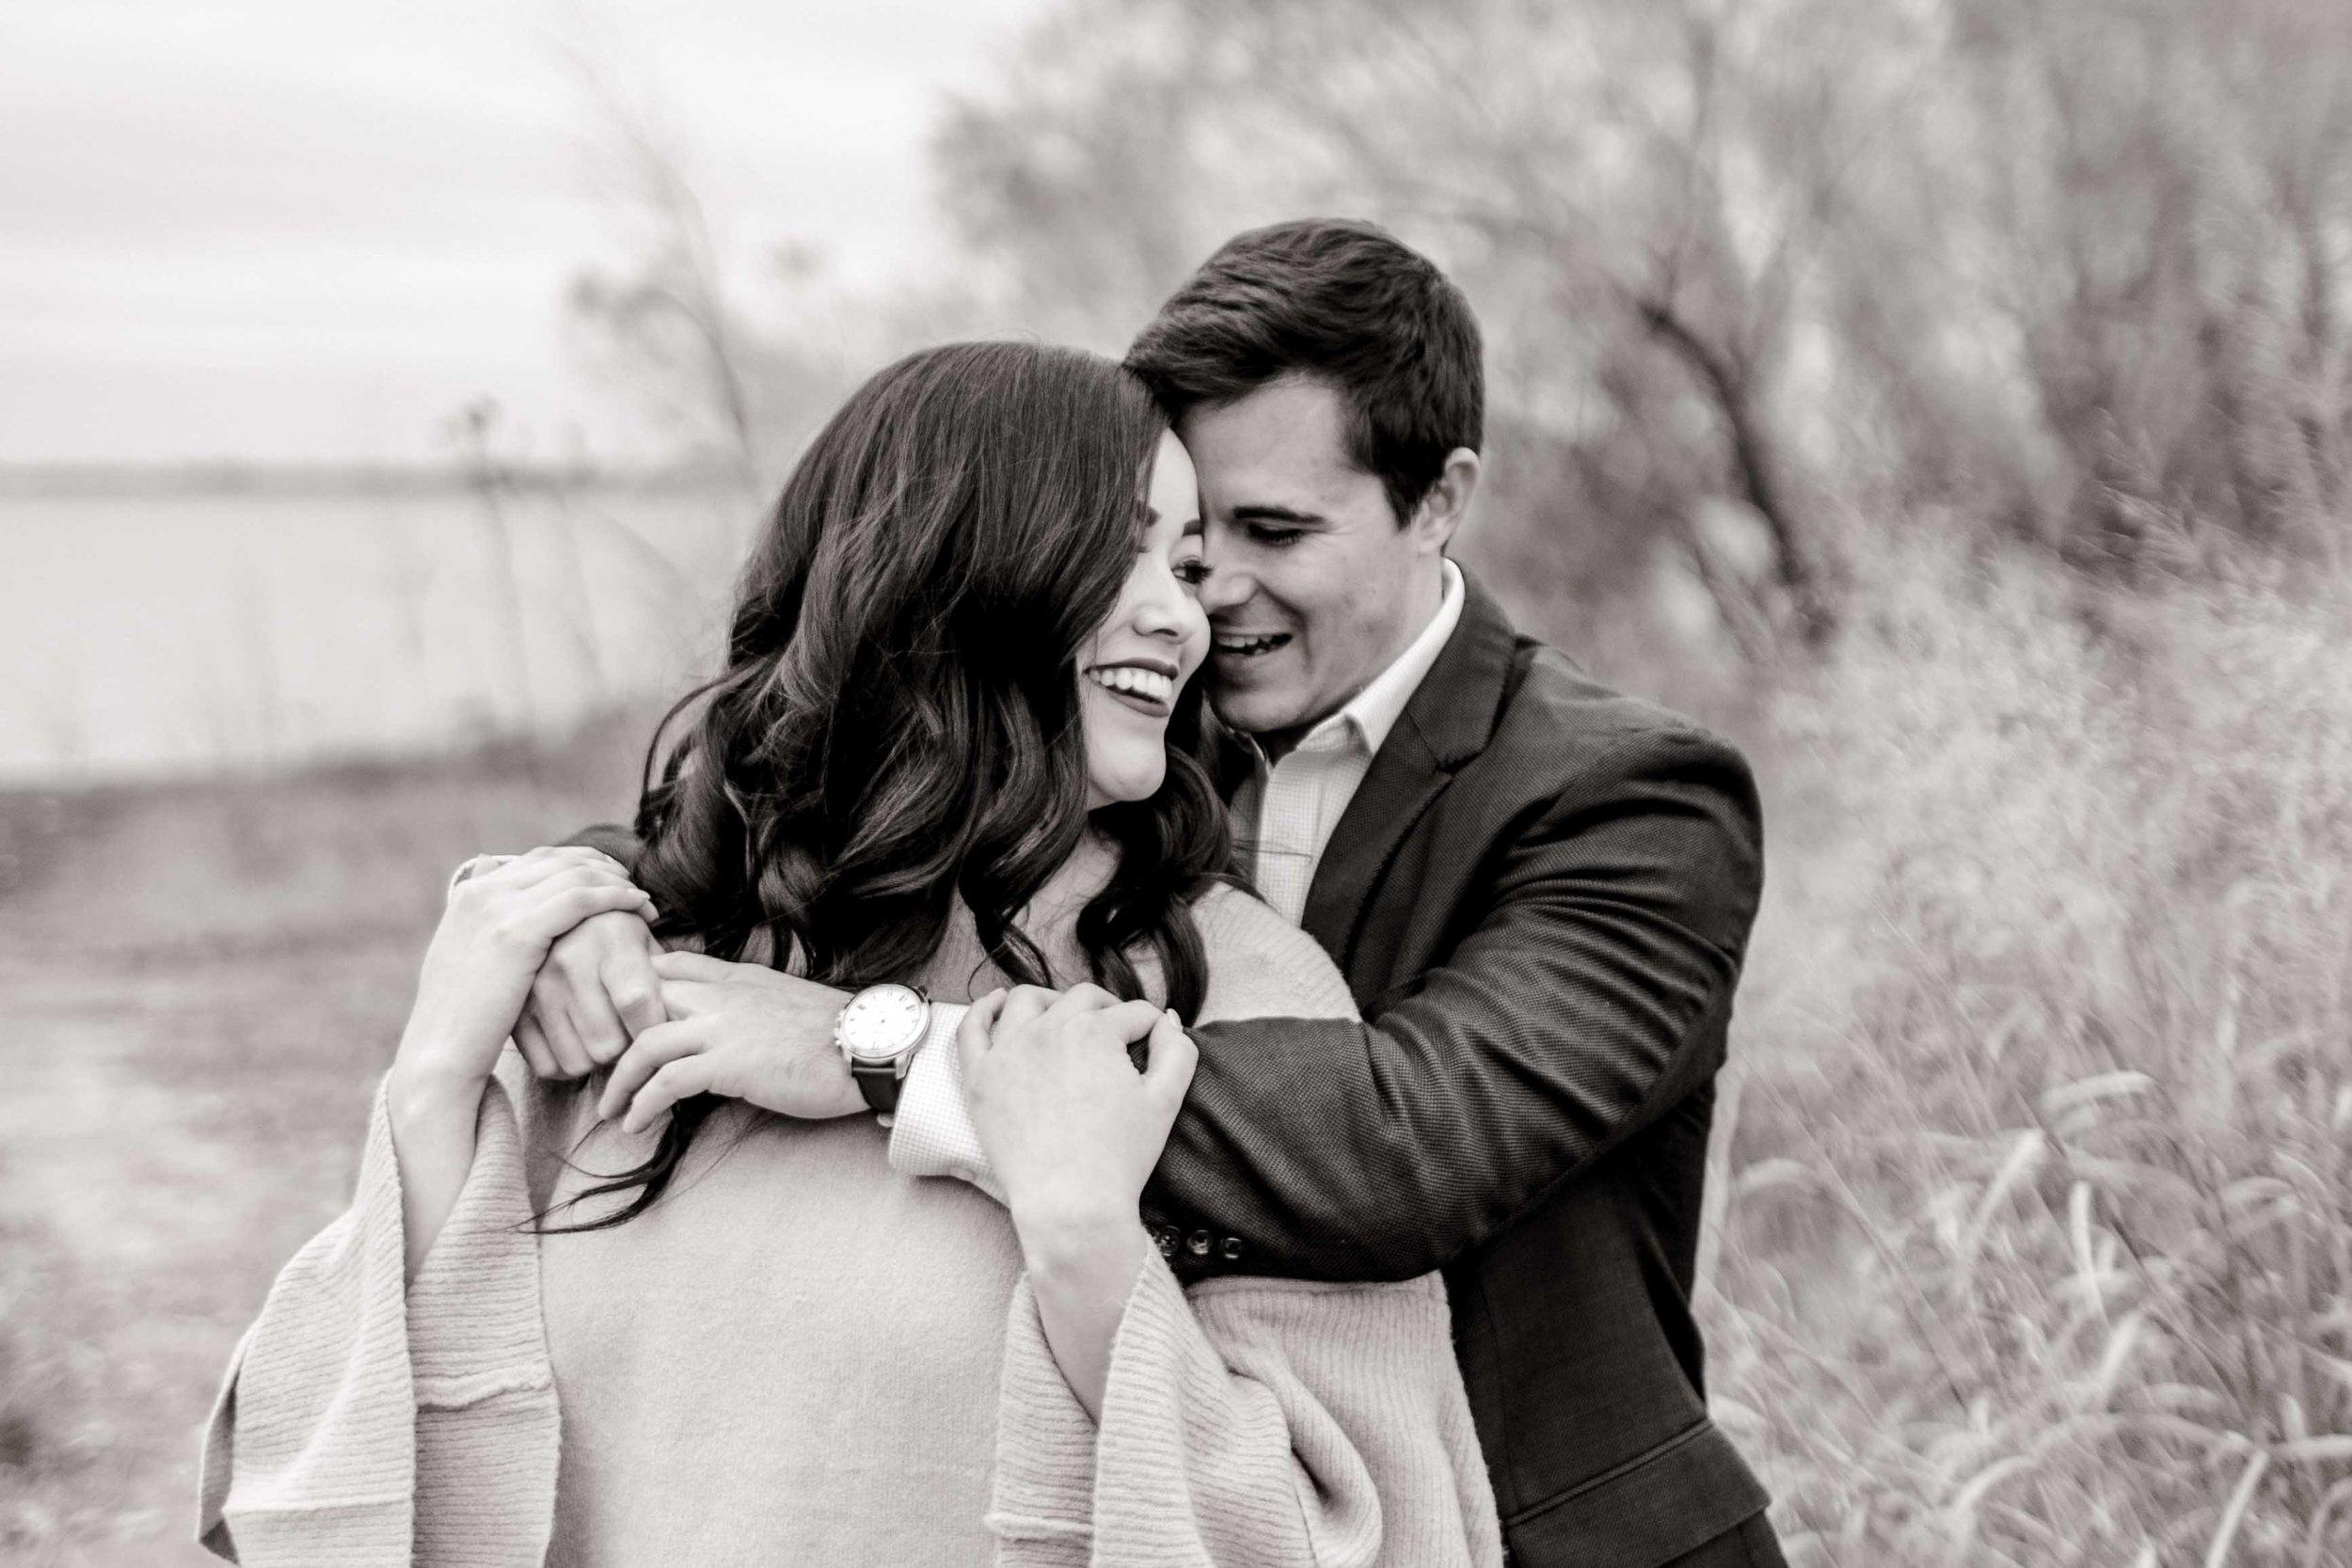 mckinney-engagement-photographer-rockwall-wedding-photographer-10.jpg